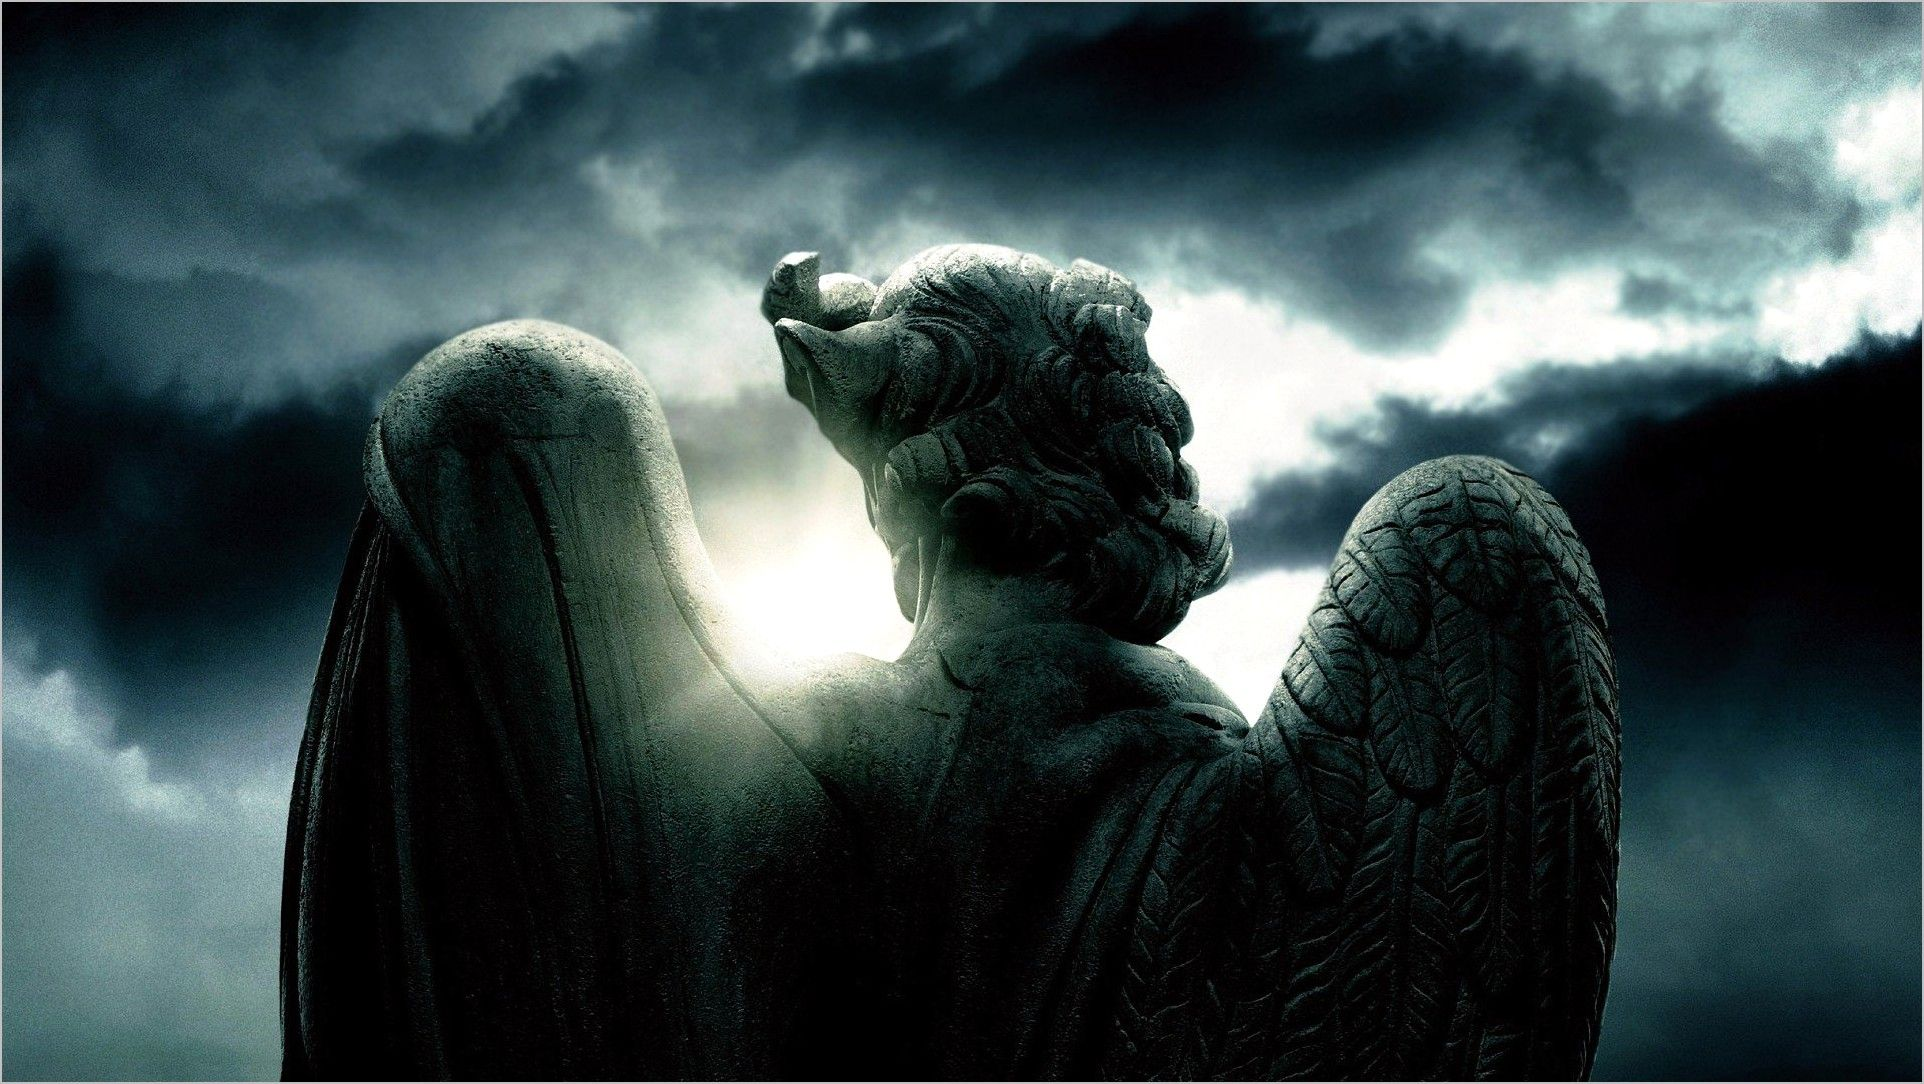 Anime Wallpaper 4k 1920 1080 Angel In 2020 Angel Clouds Angel Statues Heavenly Angels Art